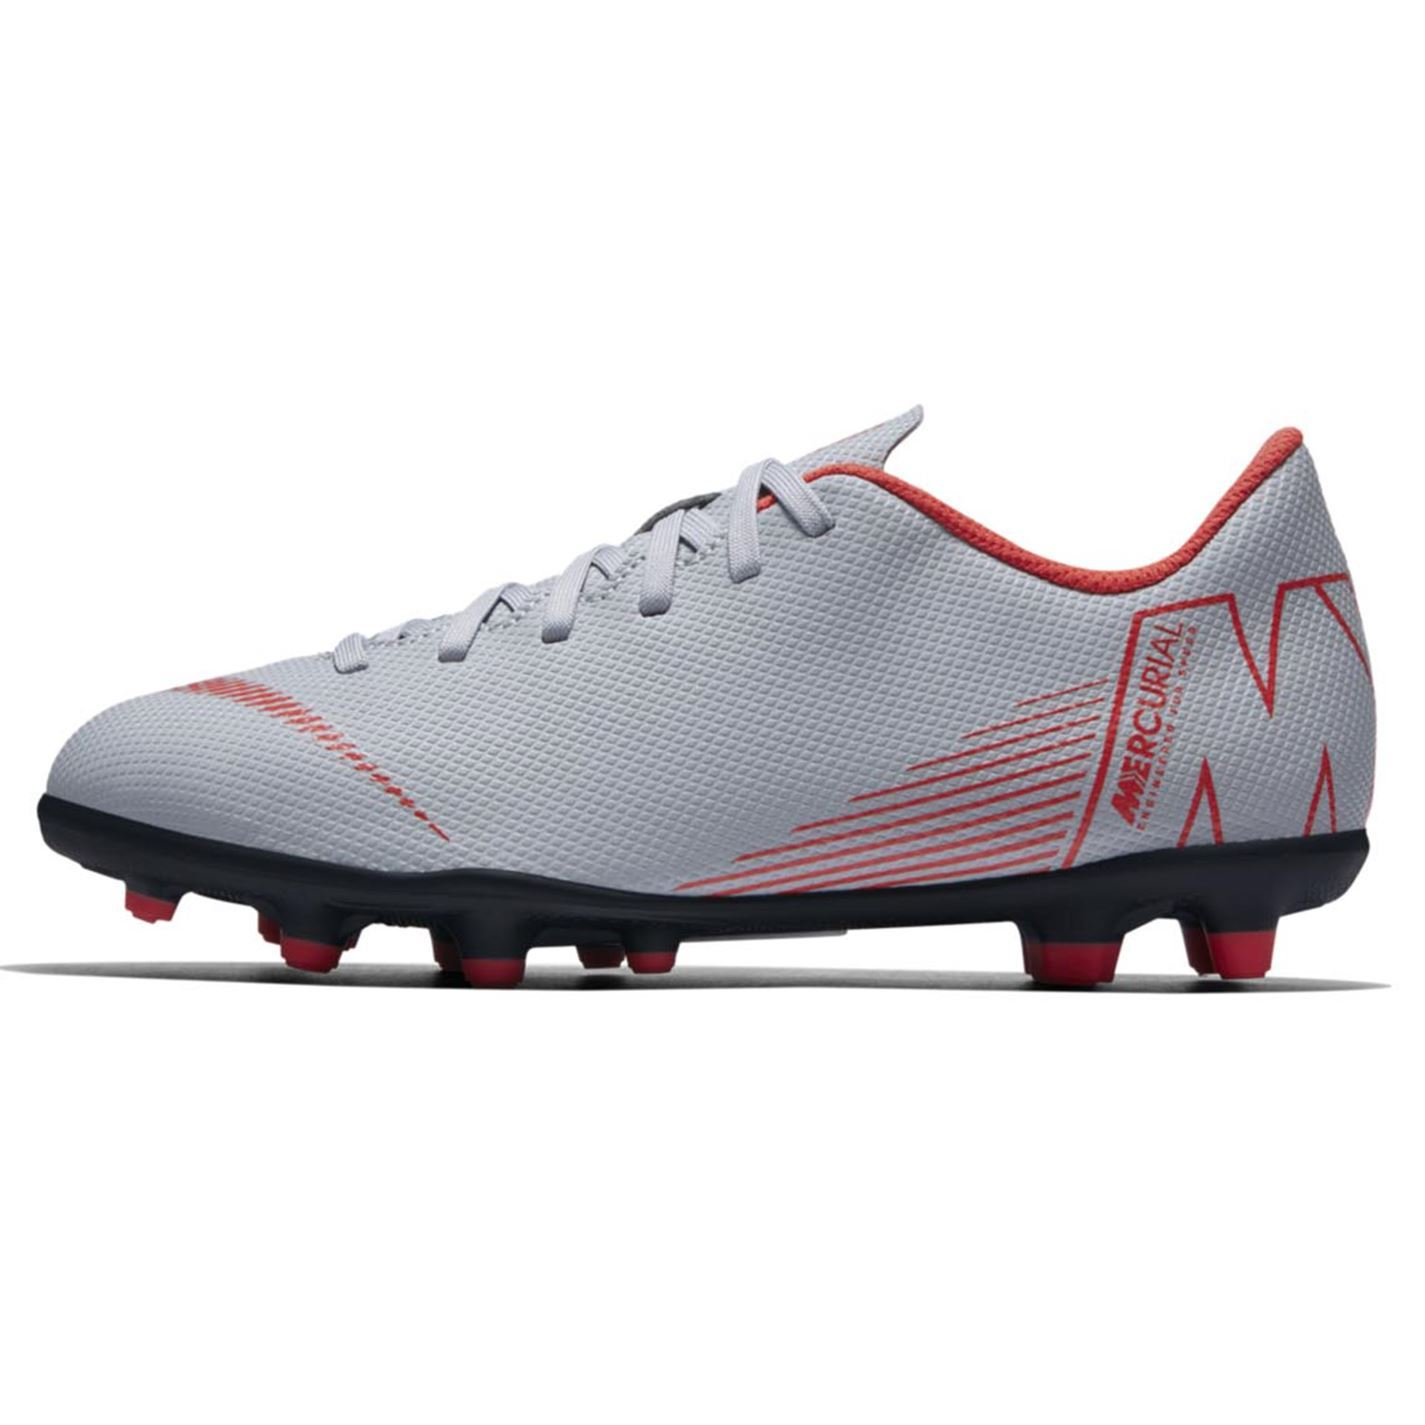 cf524955c5db ... Nike Mercurial Vapor Club FG Firm Ground Football Boots Juniors Soccer  Cleats